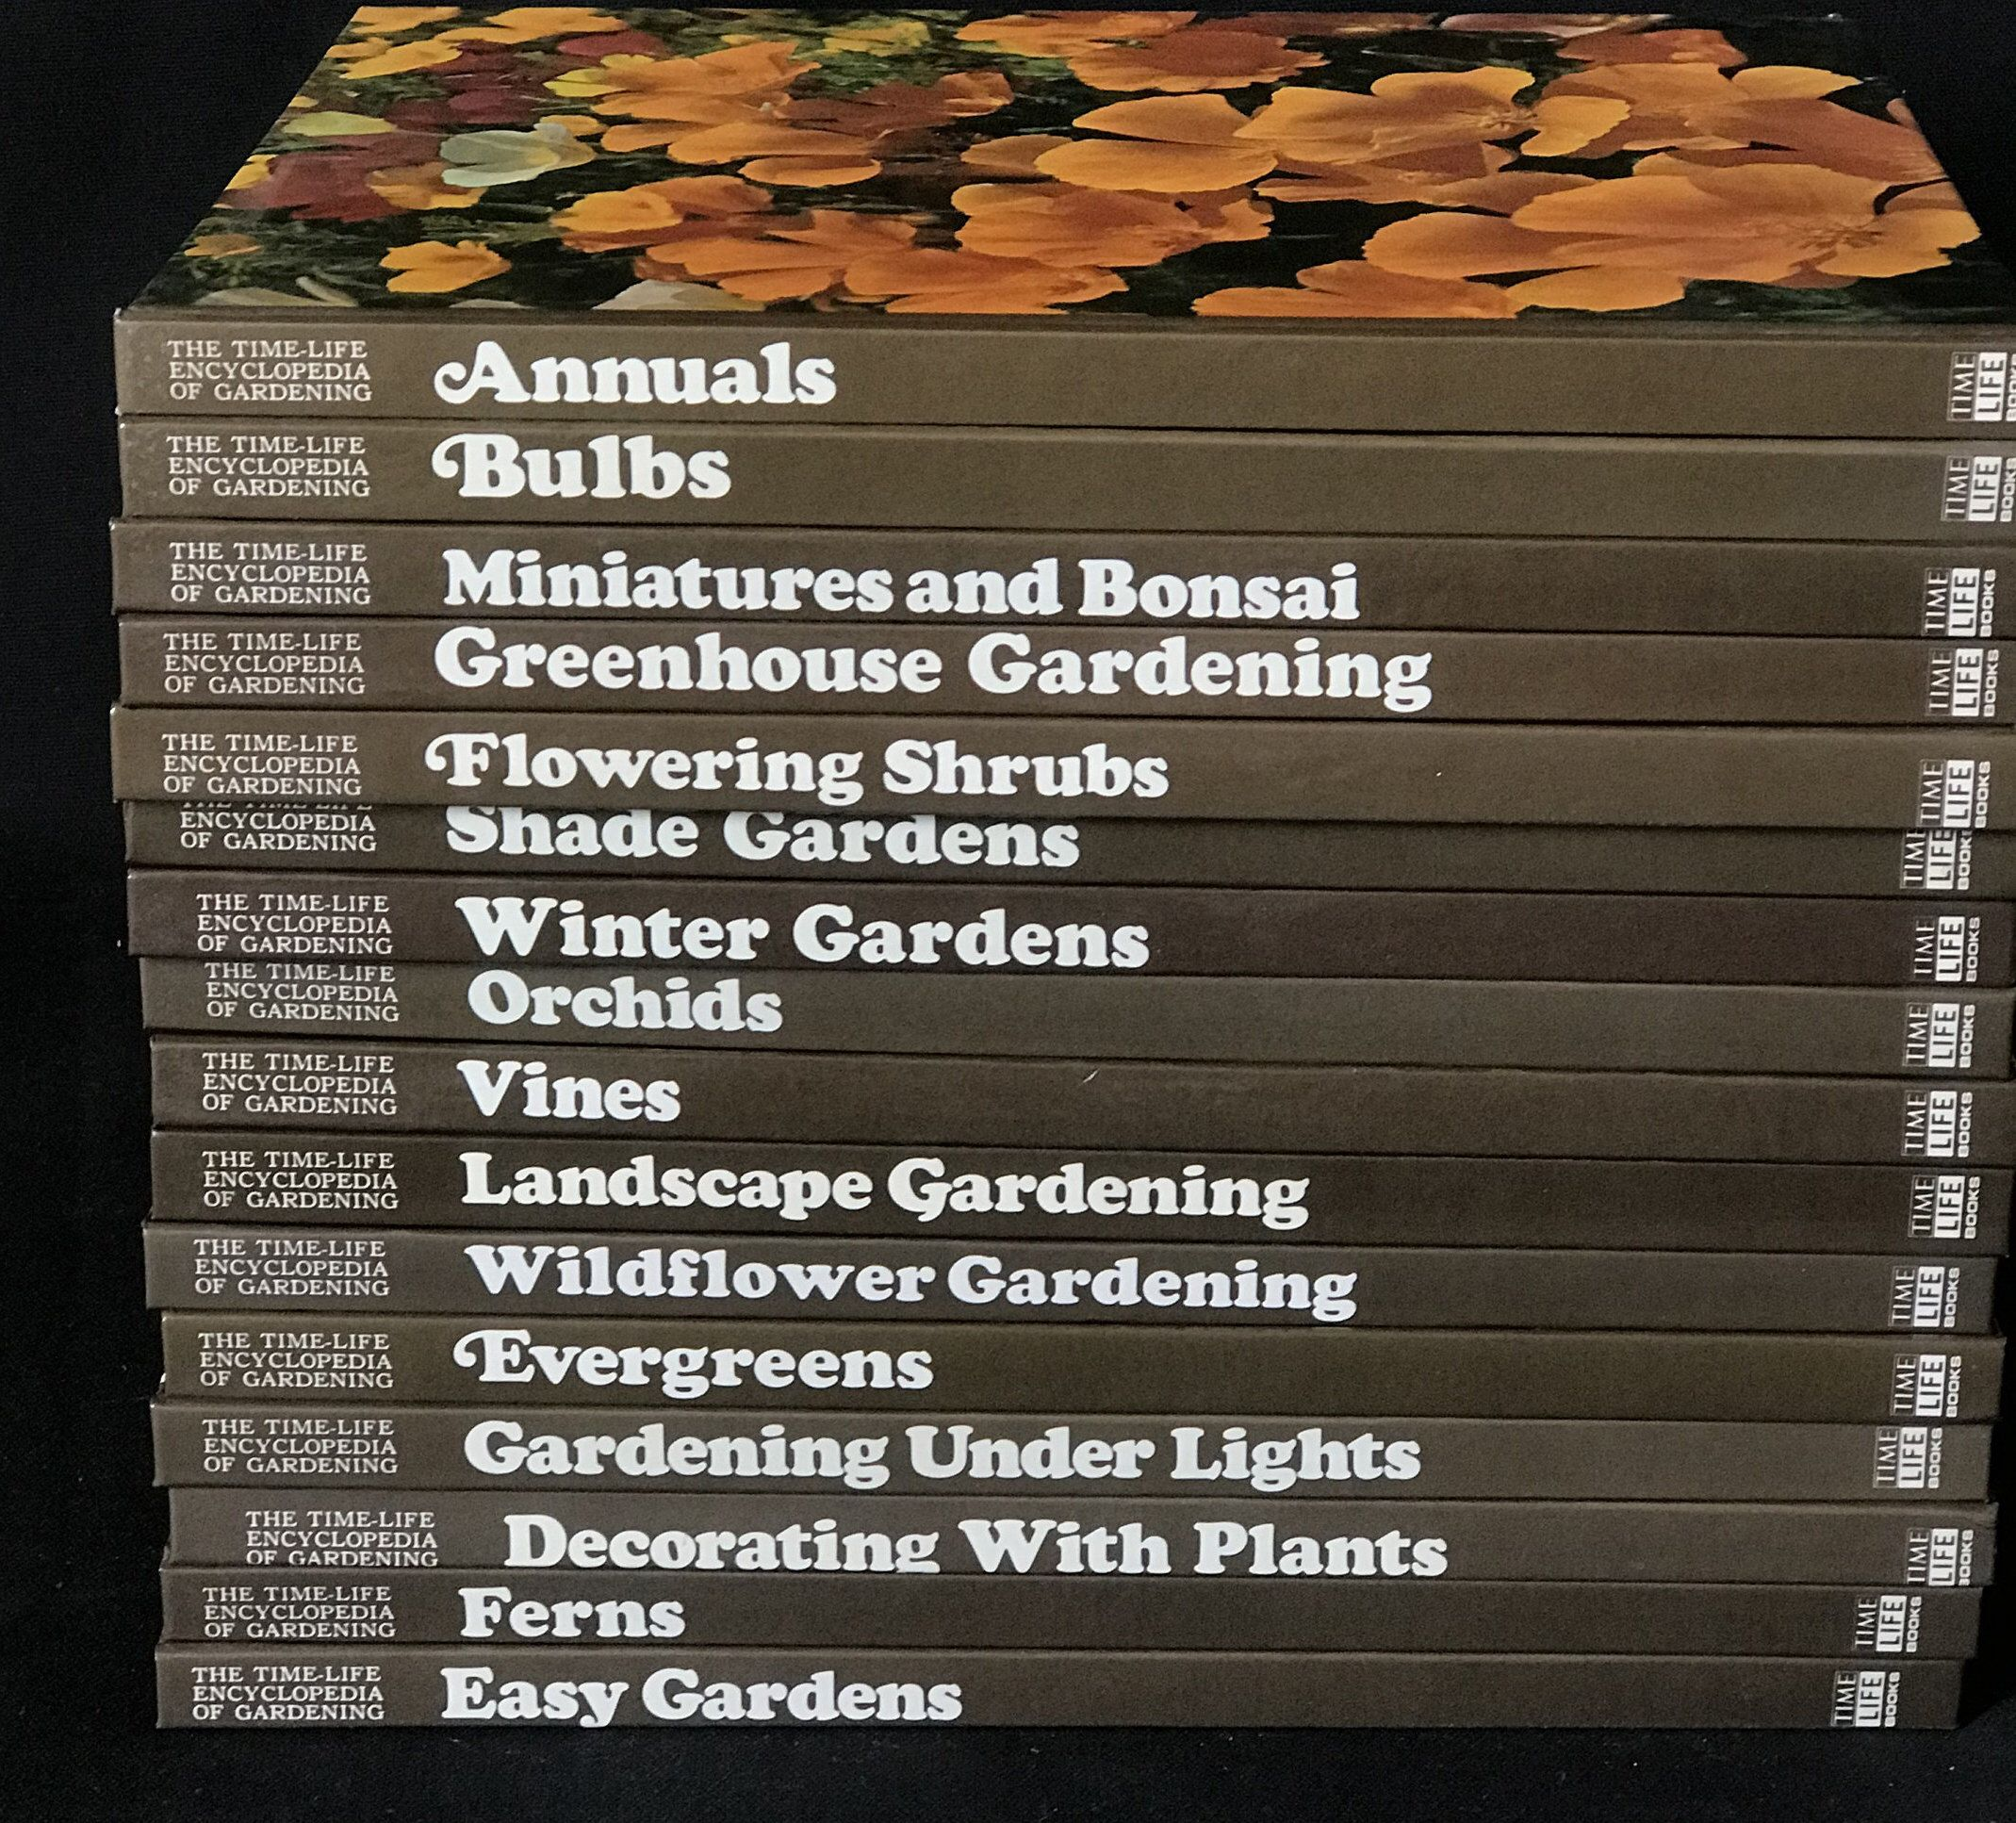 a812b9ffde4502772f62364035e1dc9c - The Time Life Encyclopedia Of Gardening